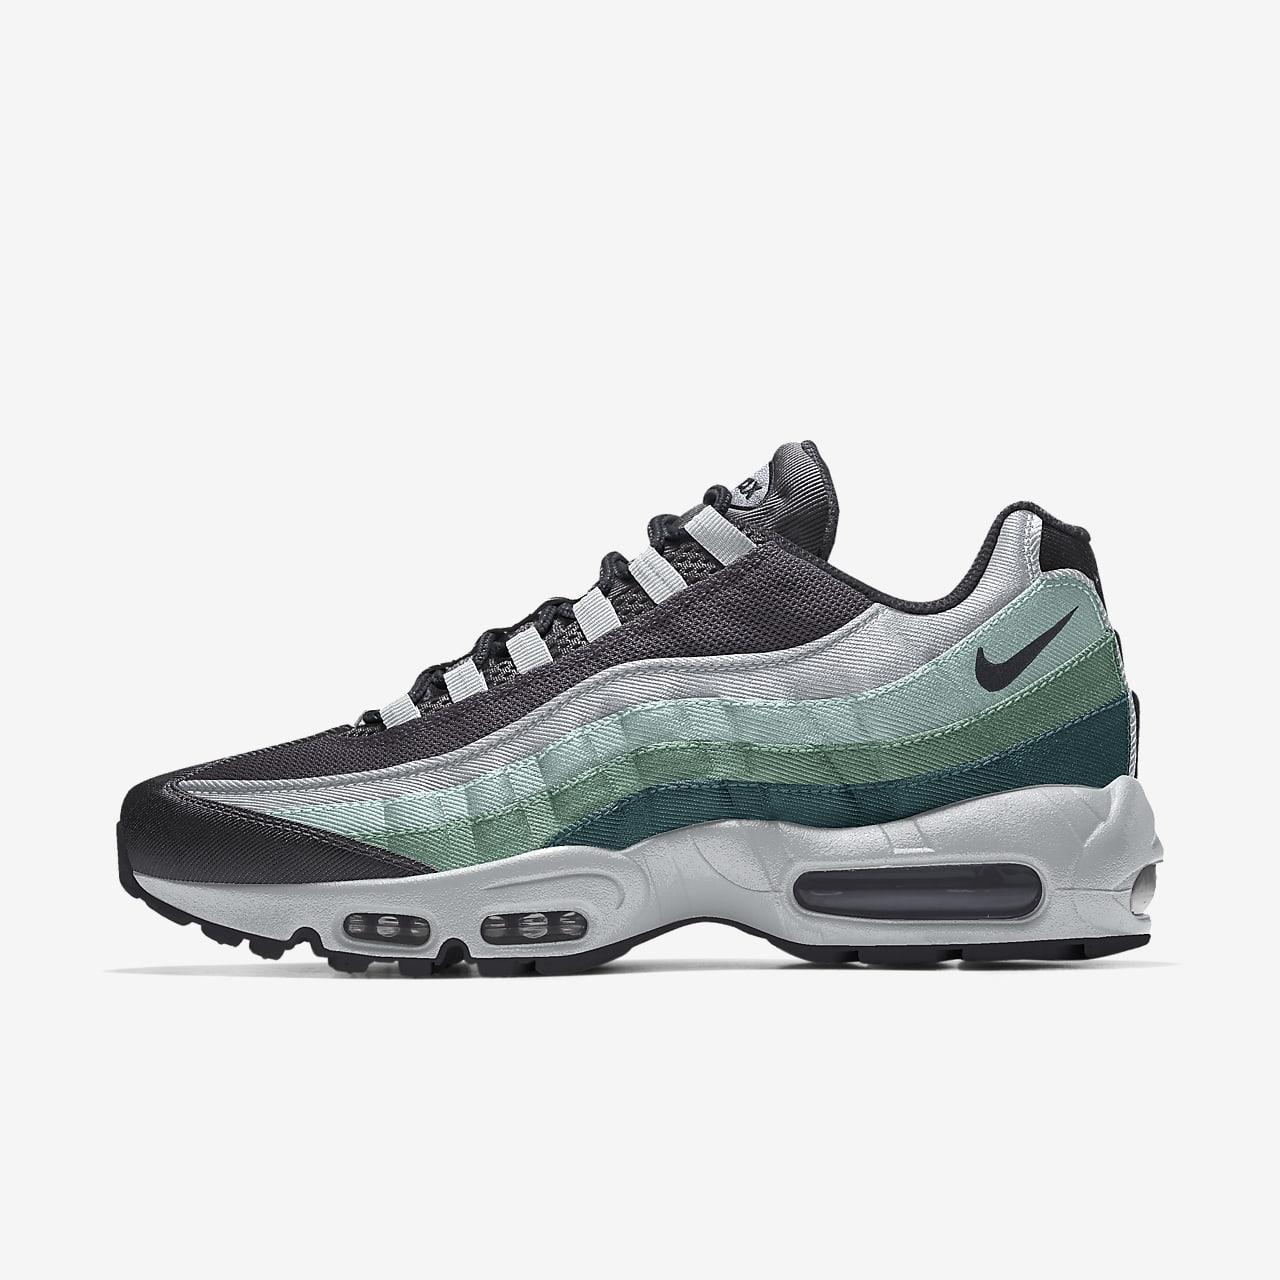 Nike Air Max 95 By You Custom Shoe